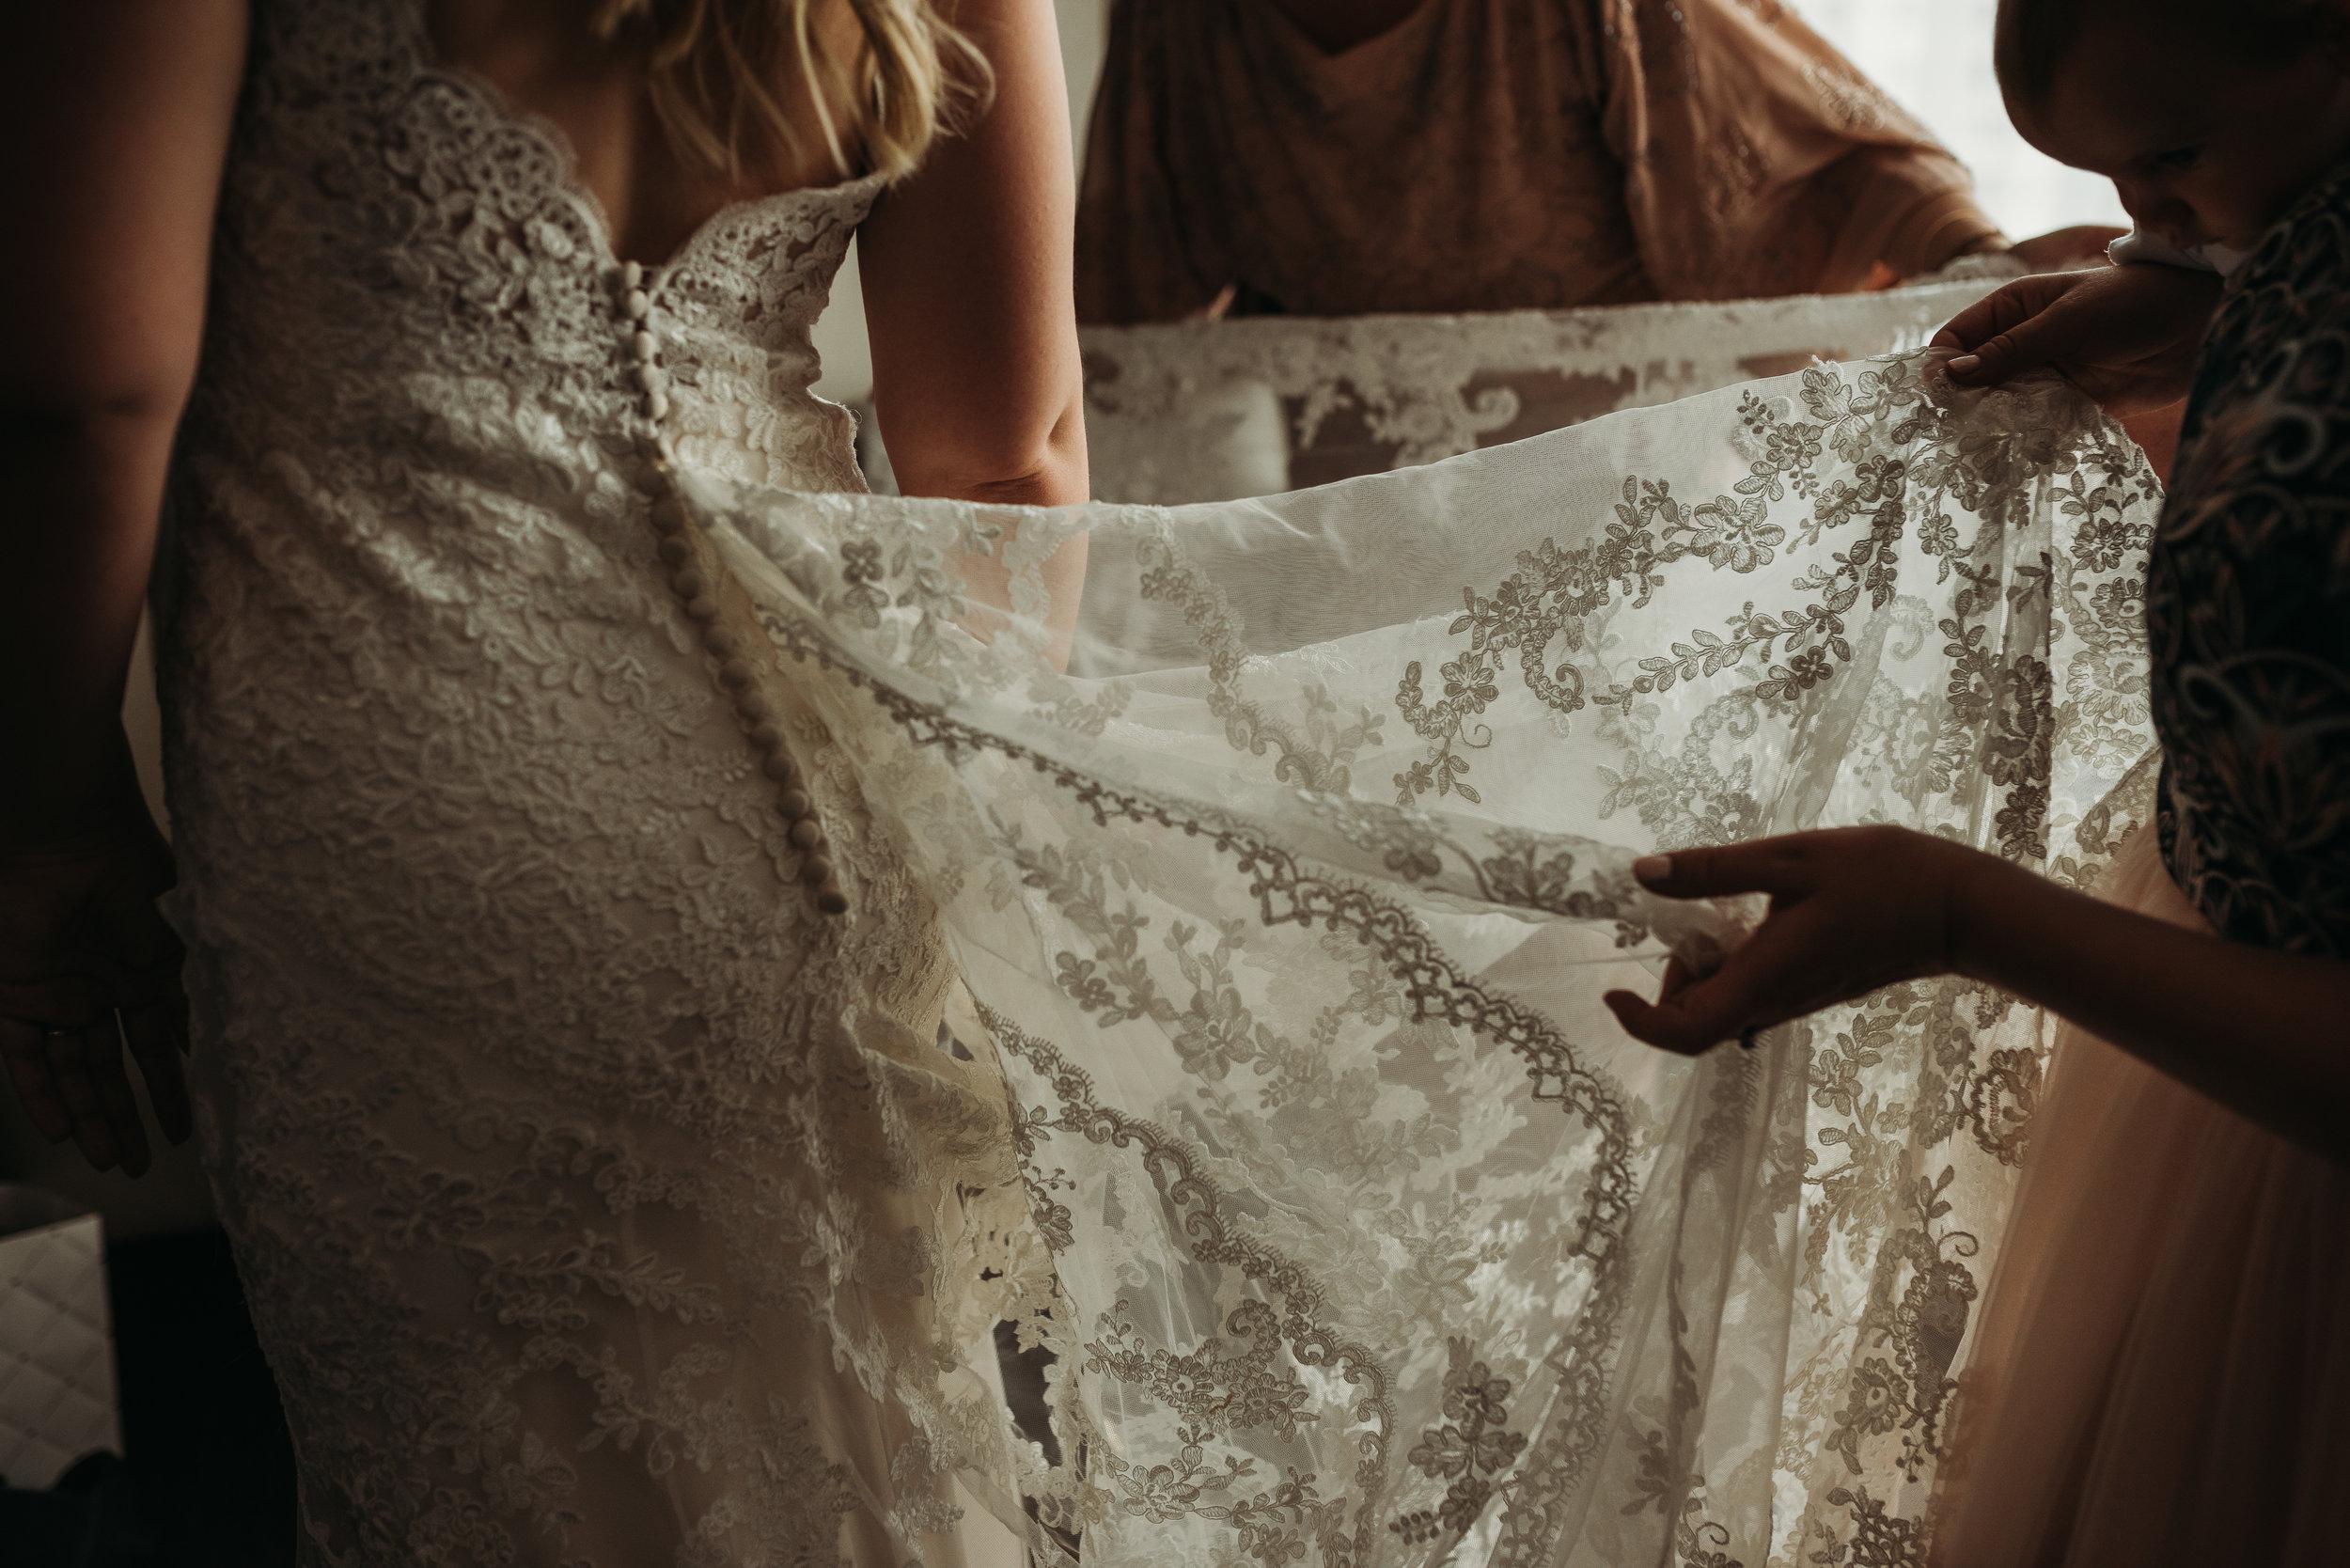 bride-lace-wedding-dress-getting-ready-photos-toronto-rustic-boho-airship37-wedding-by-willow-birch-photo-toronto-documentary-wedding-photographers.jpg